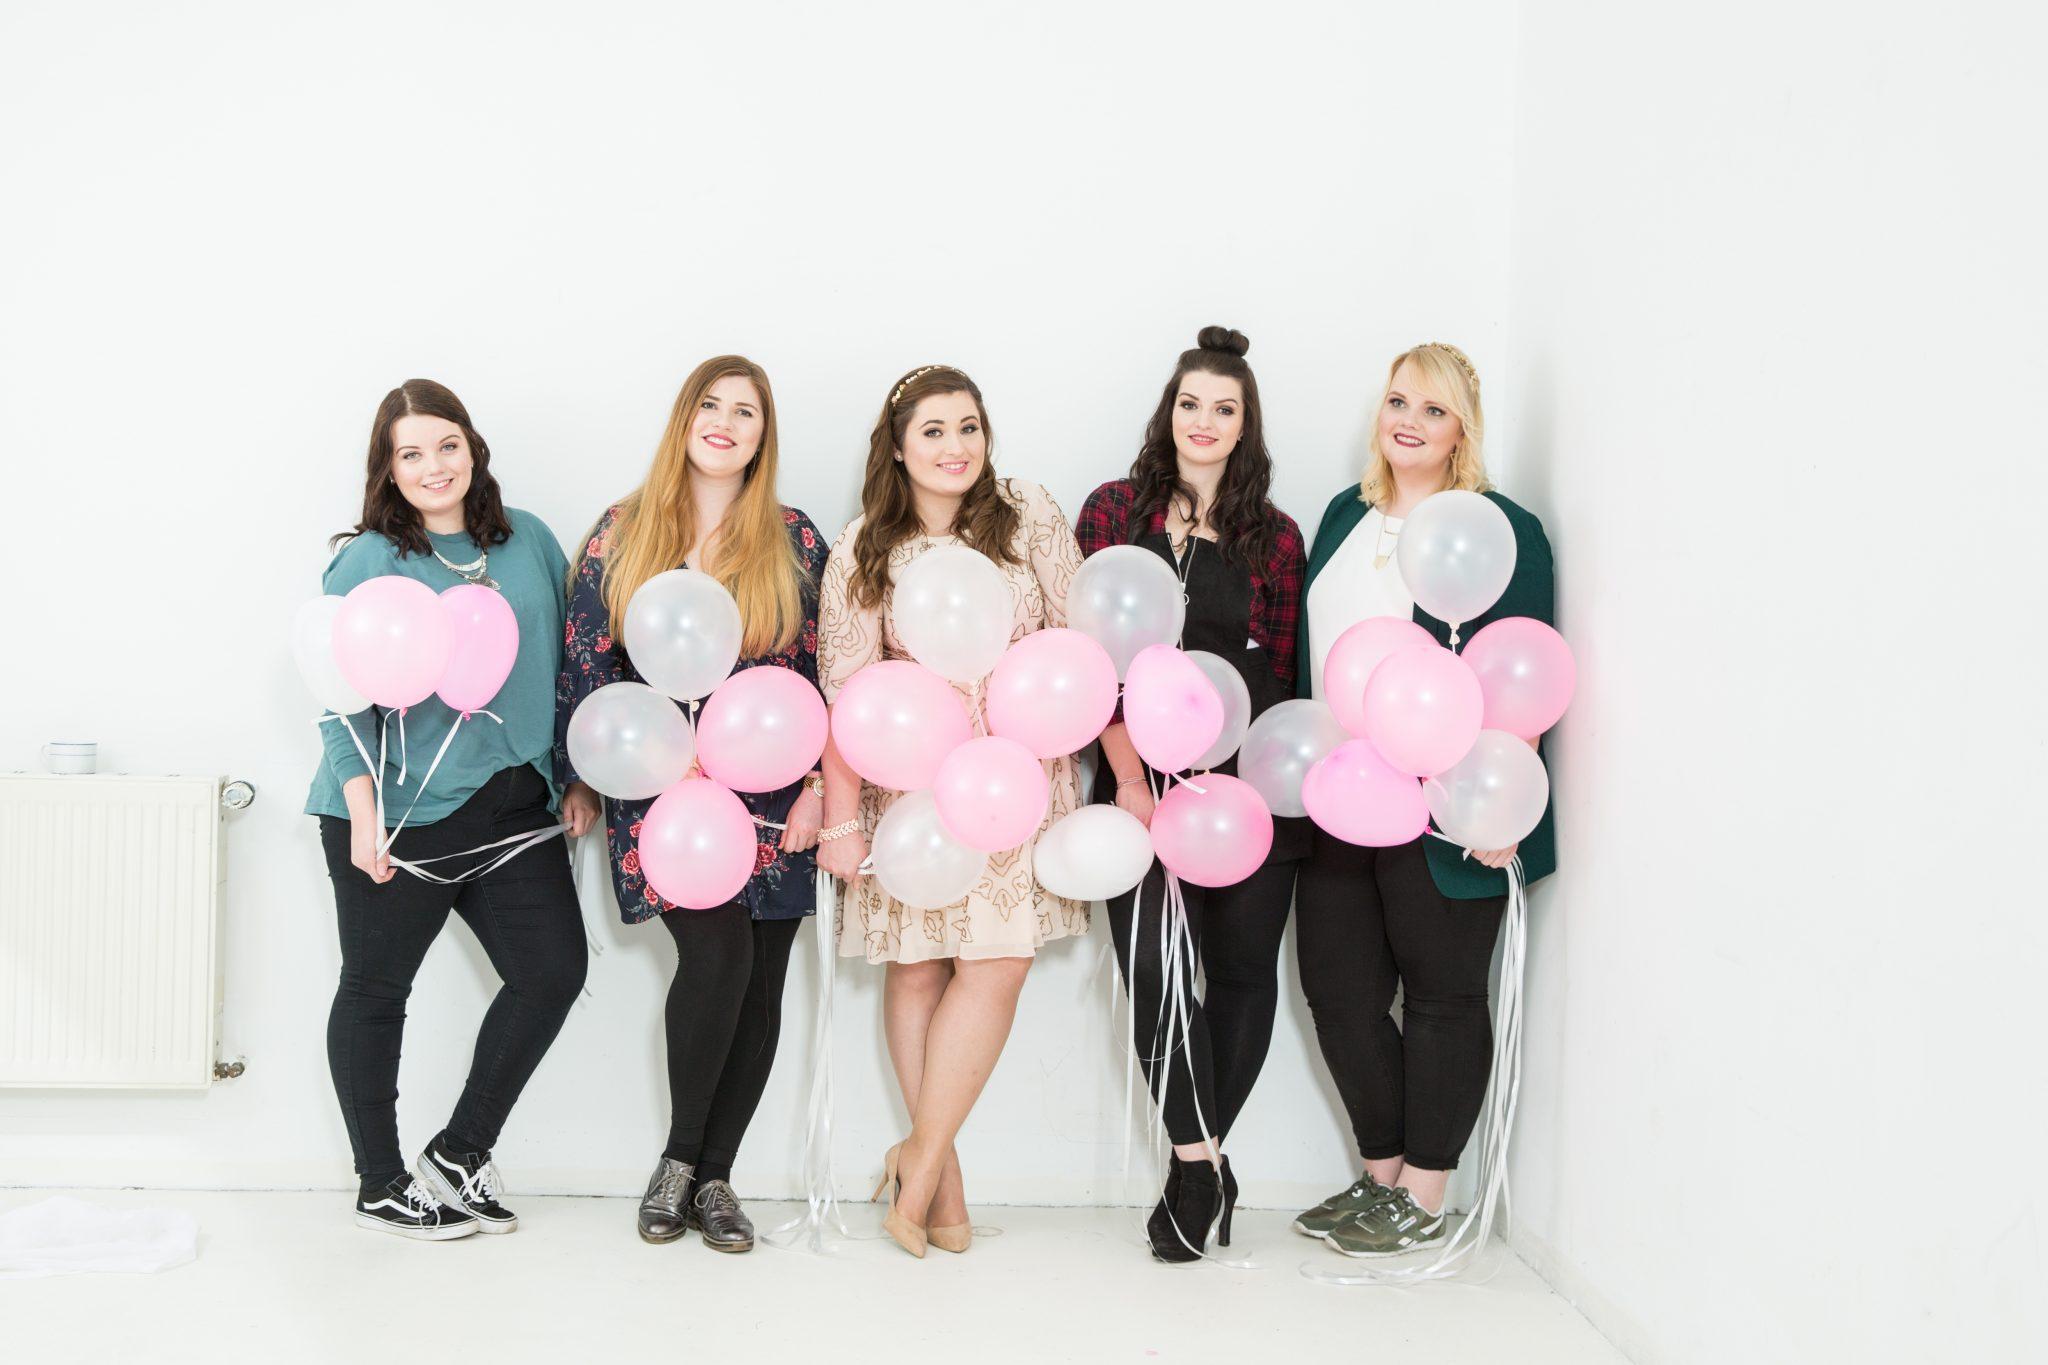 luftballon-bild-blogger